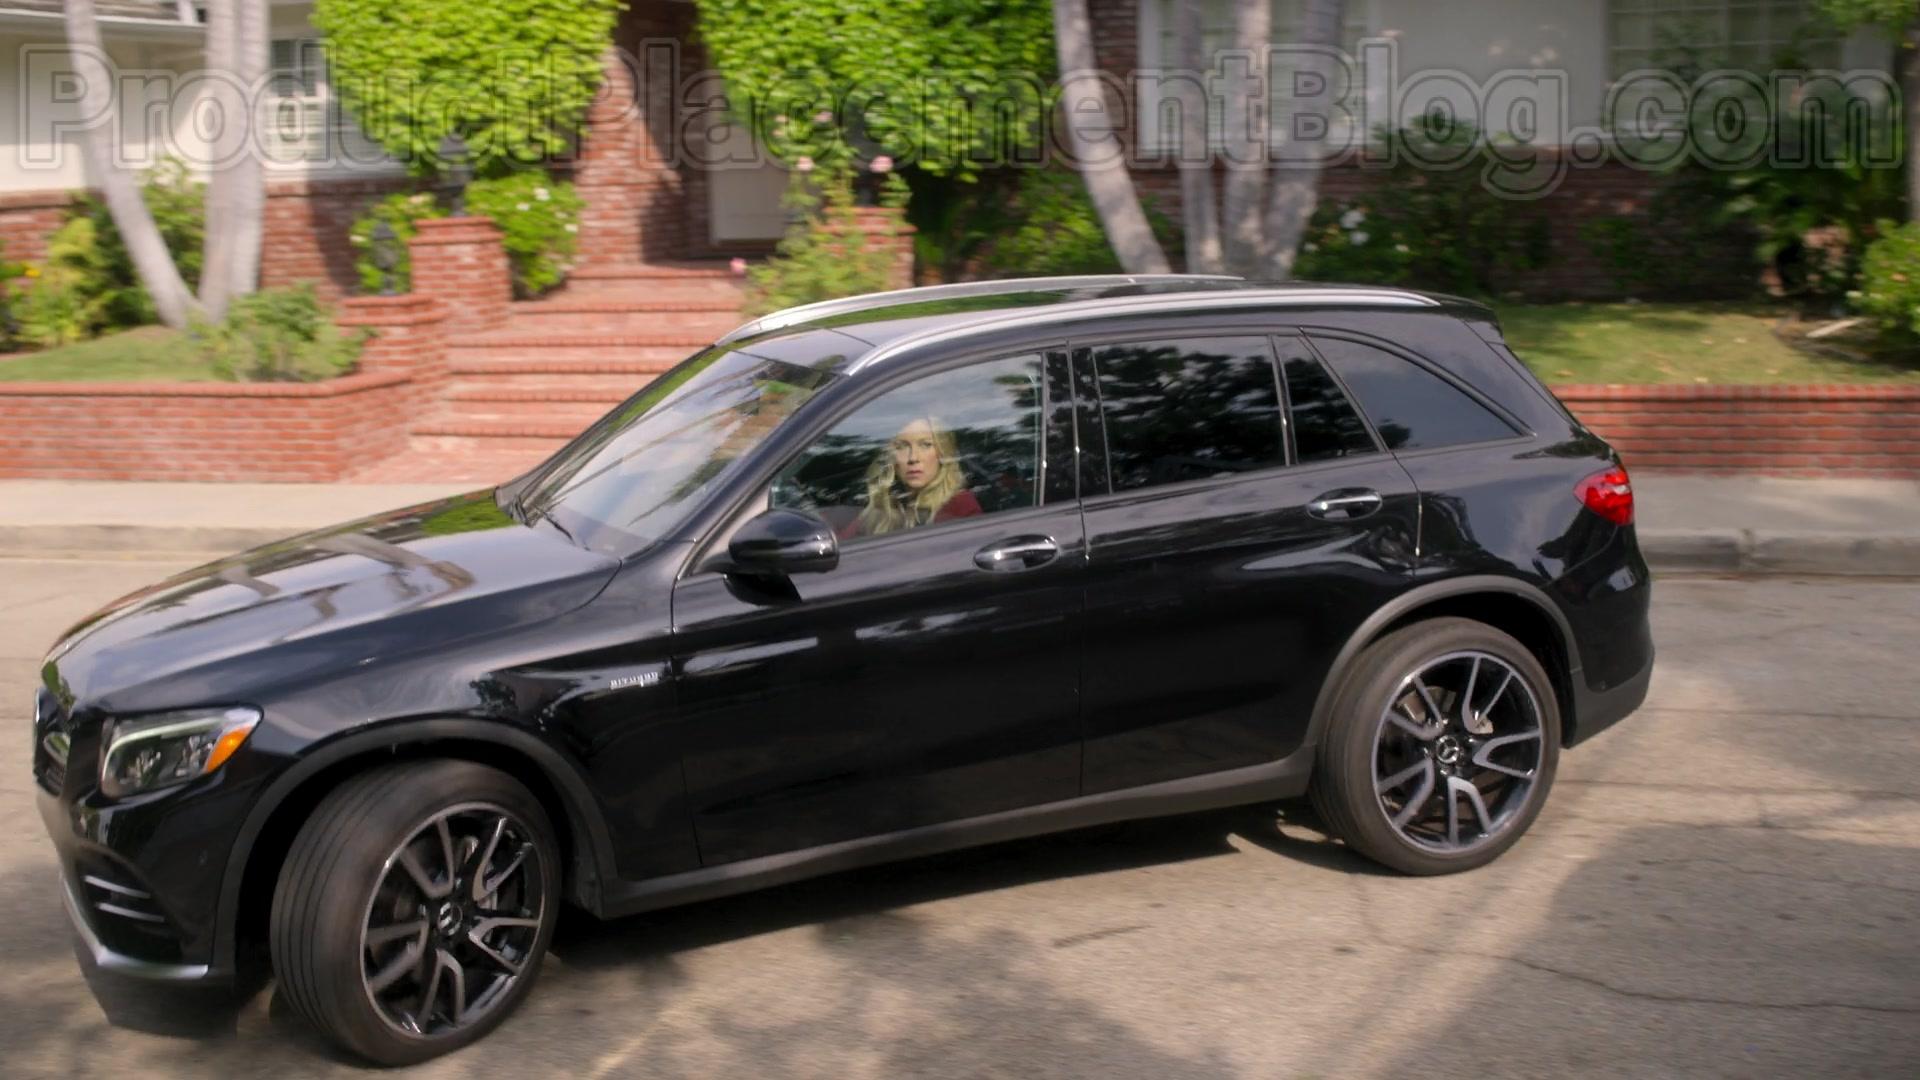 Mercedes-Benz AMG GLC43 Black Car Driven by Christina ...